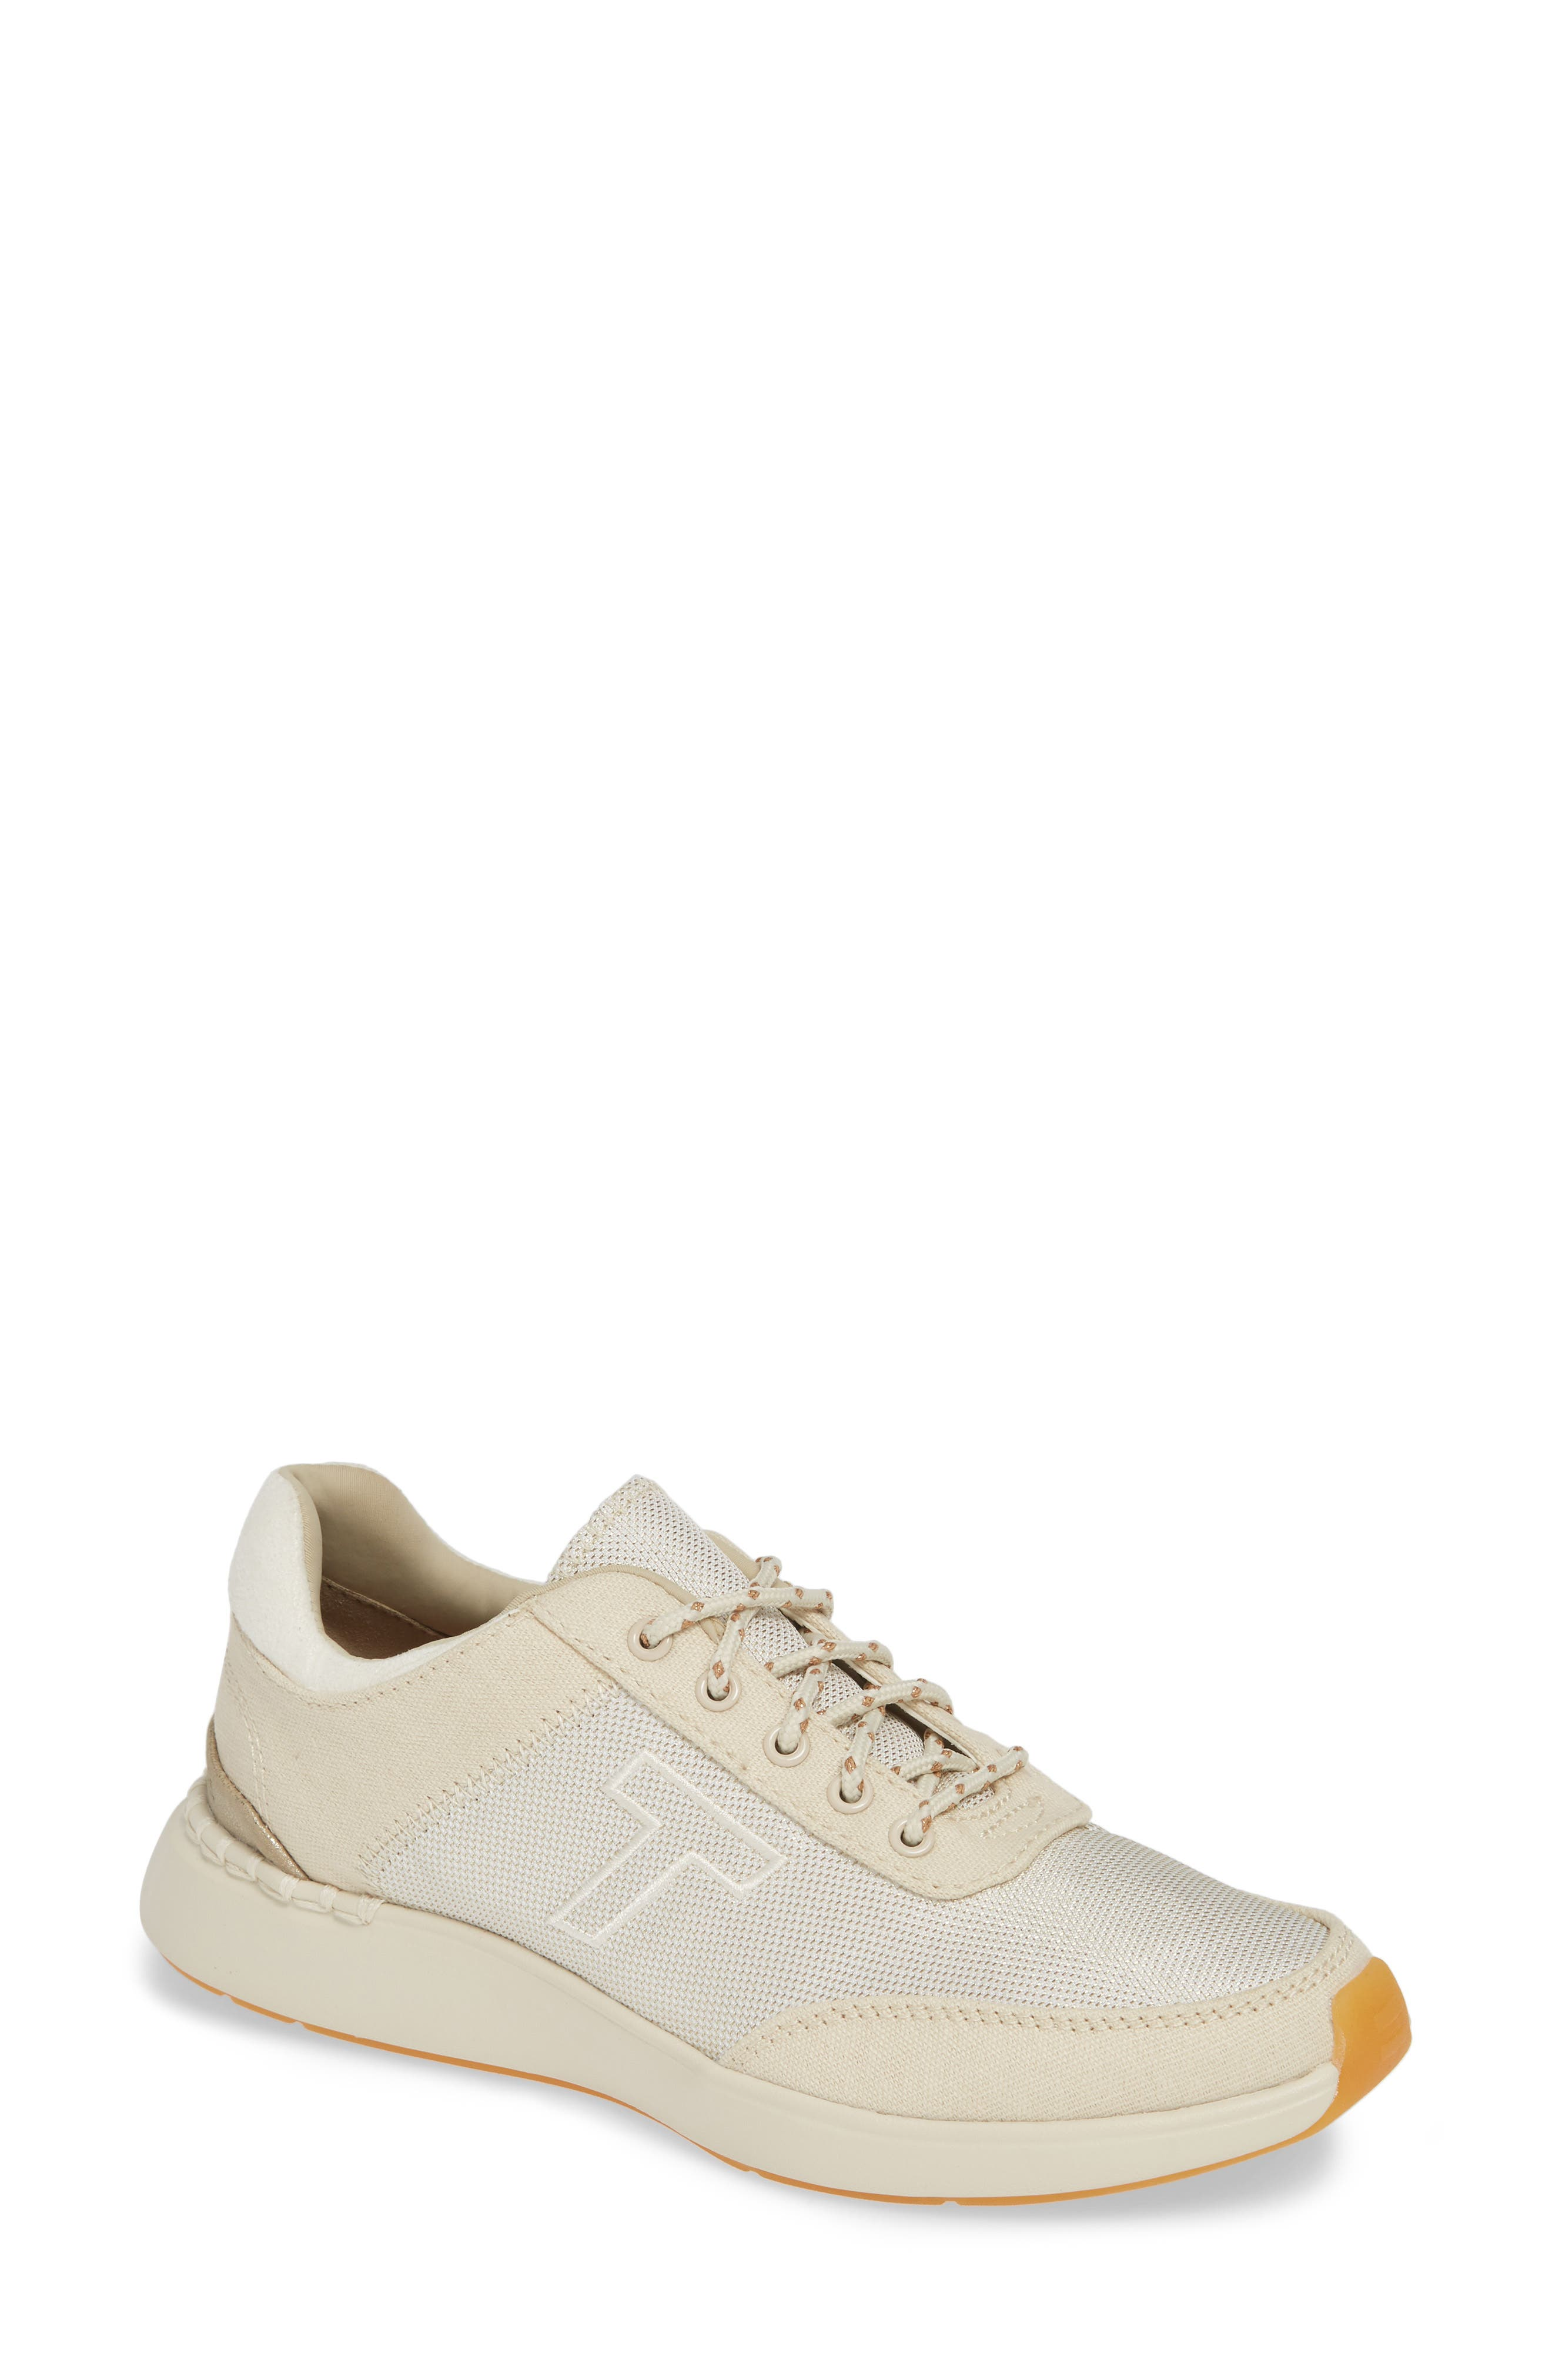 Toms Arroyo Sneaker, Beige